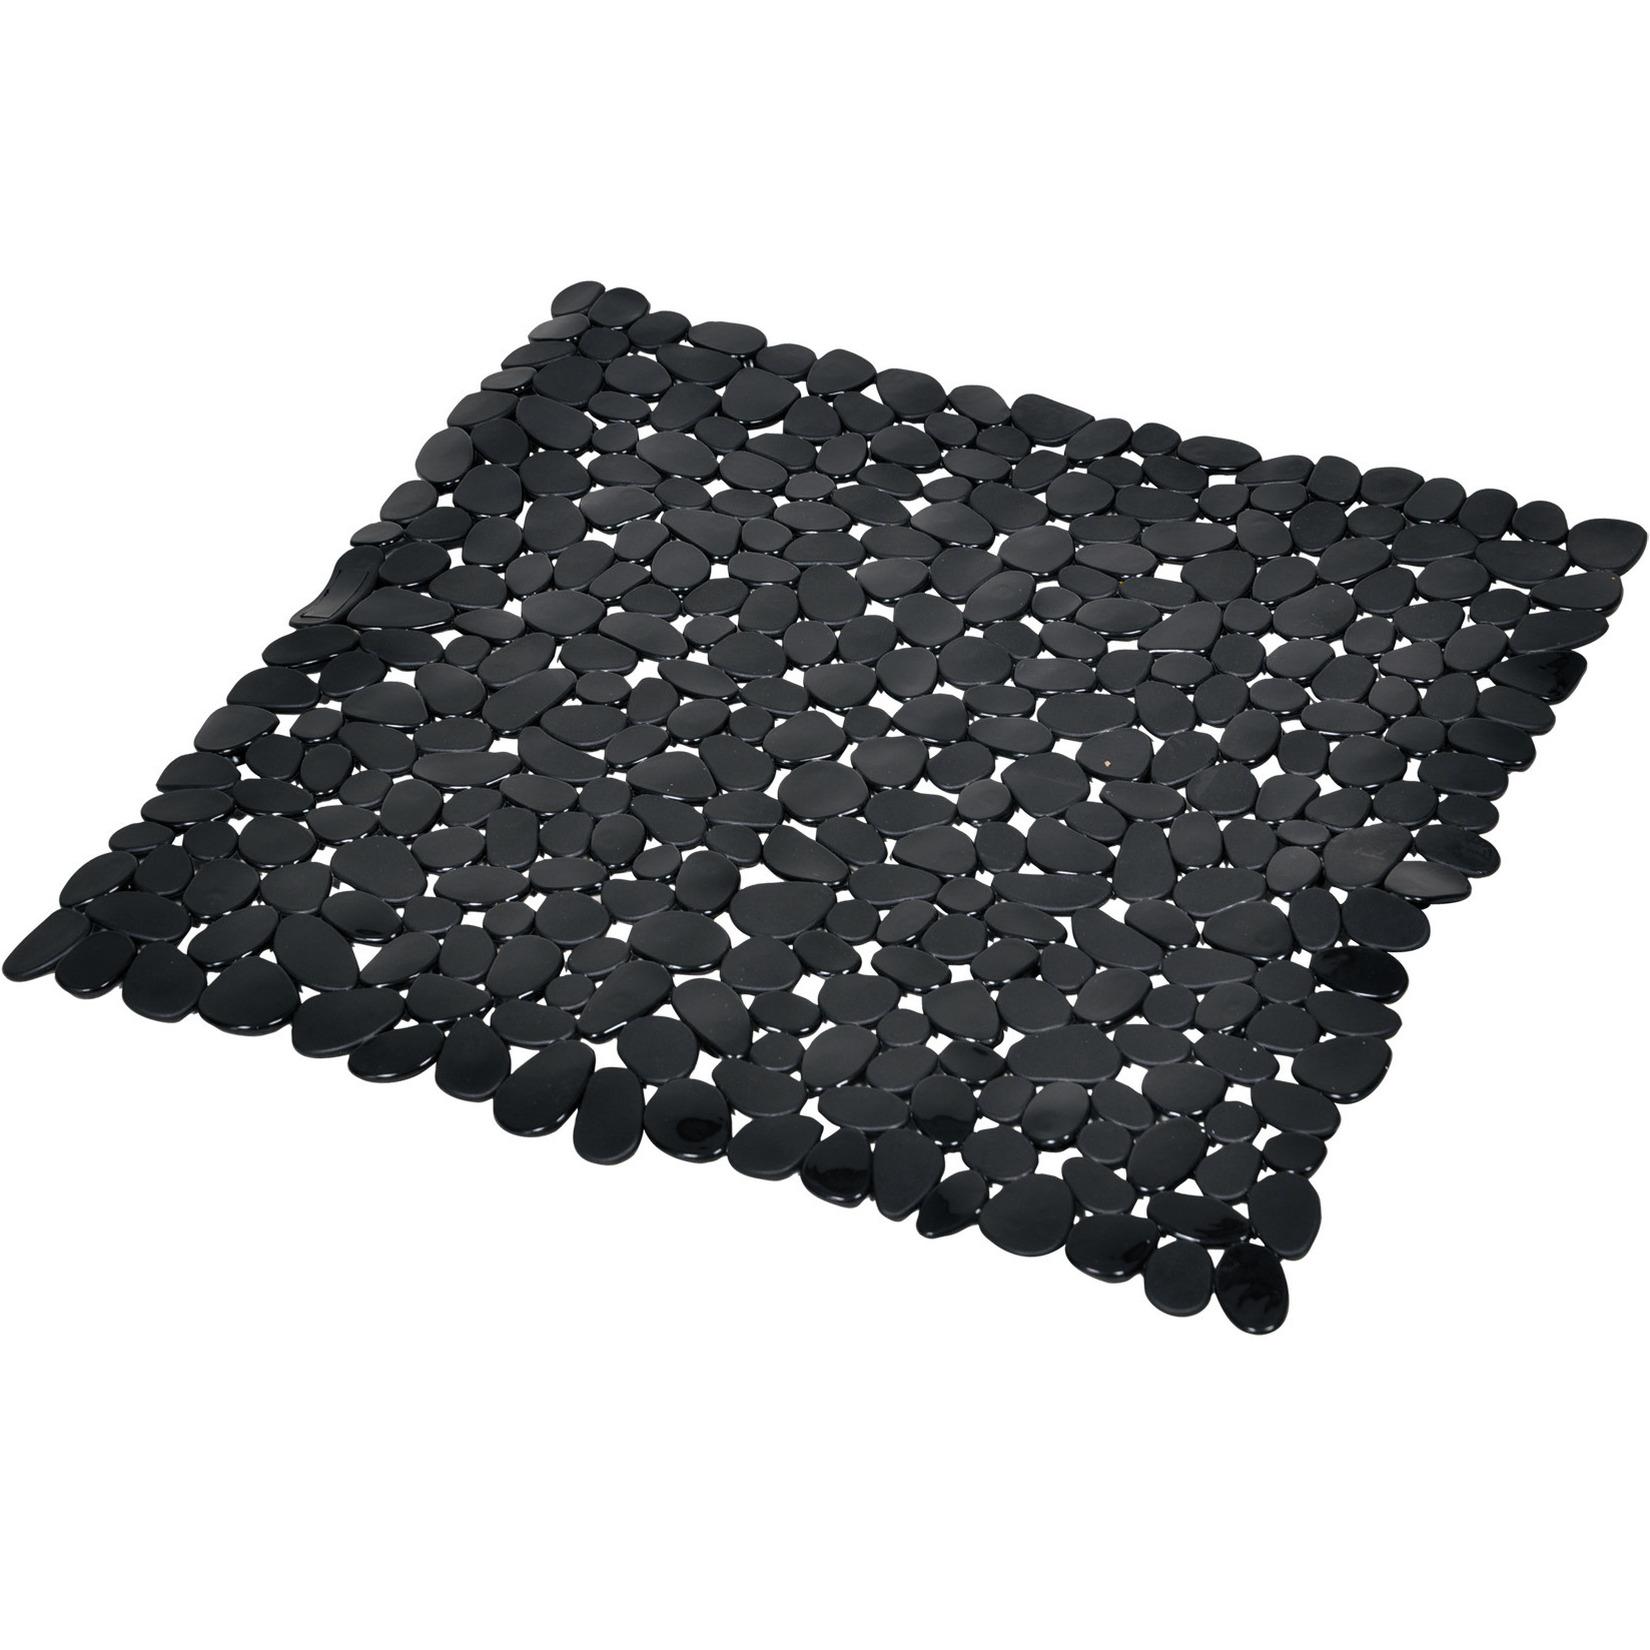 Zwarte anti-slip douchemat 52 x 52 cm vierkant